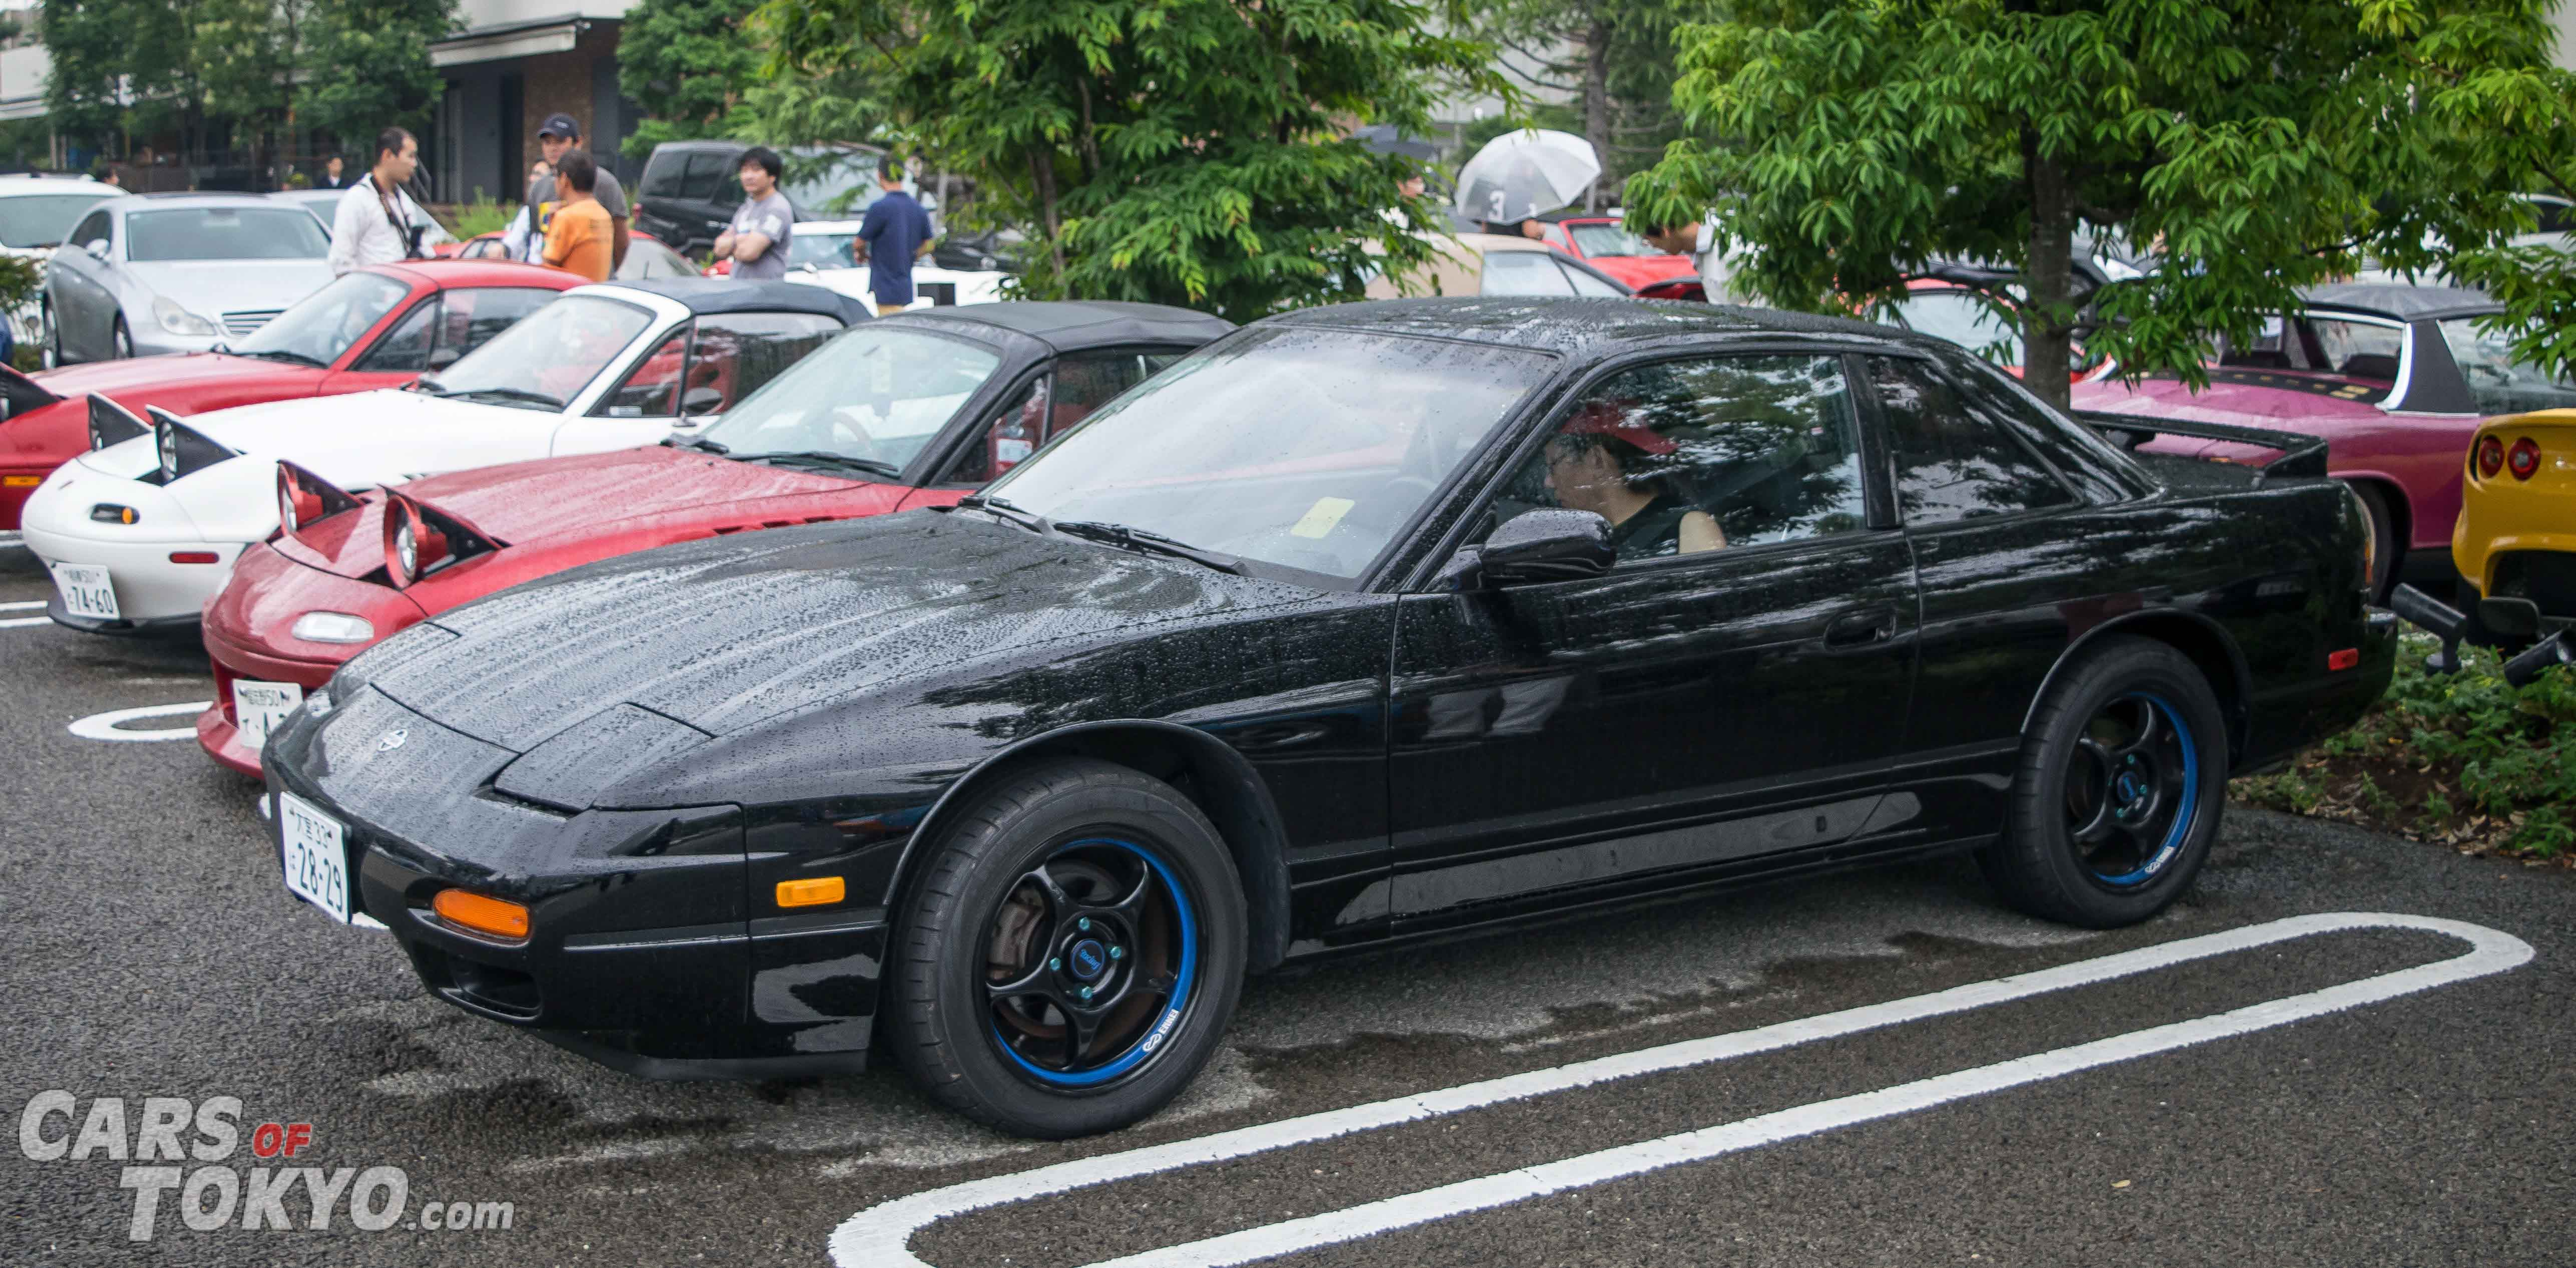 Cars of Tokyo Nissan Sileighty